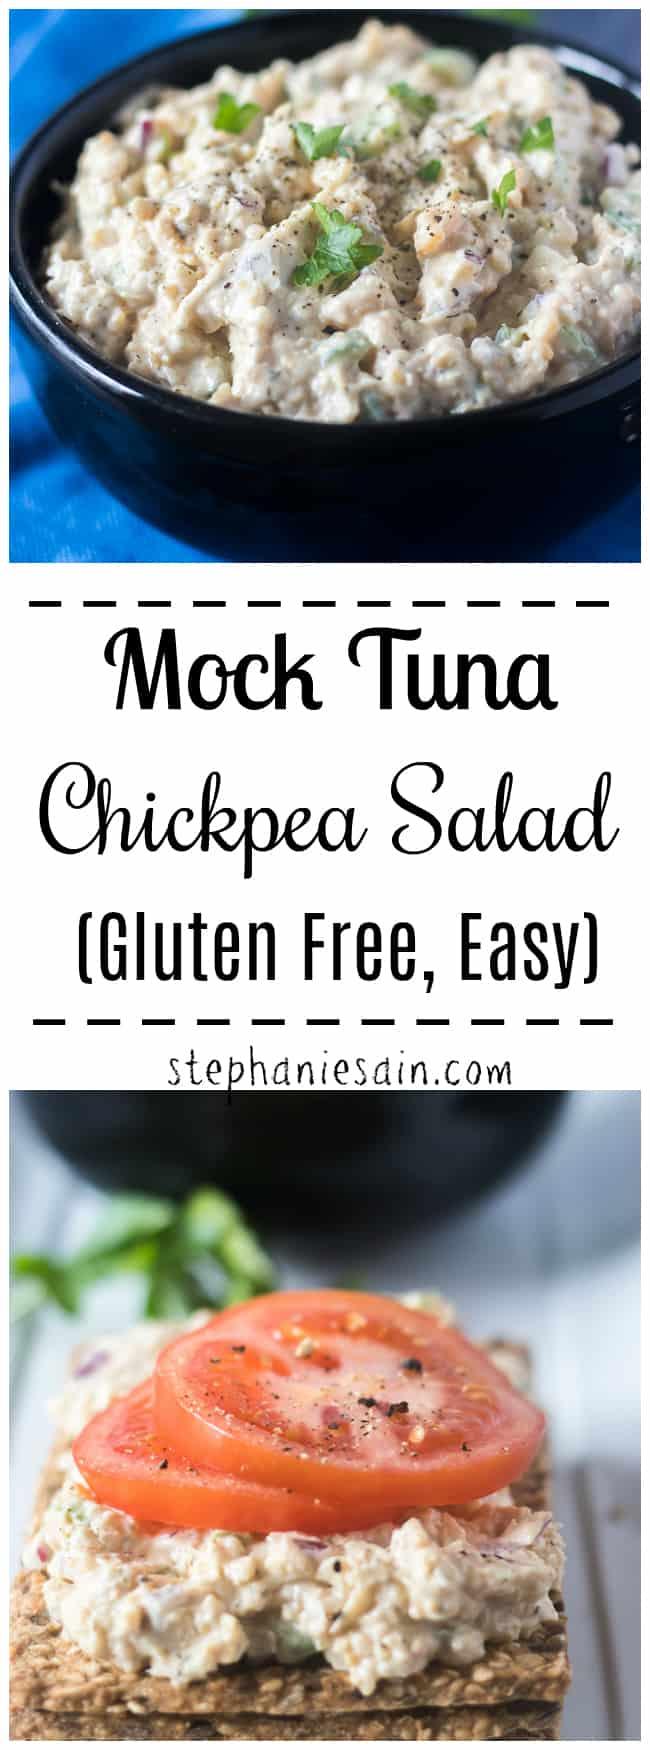 Mock Tuna Chickpea Salad